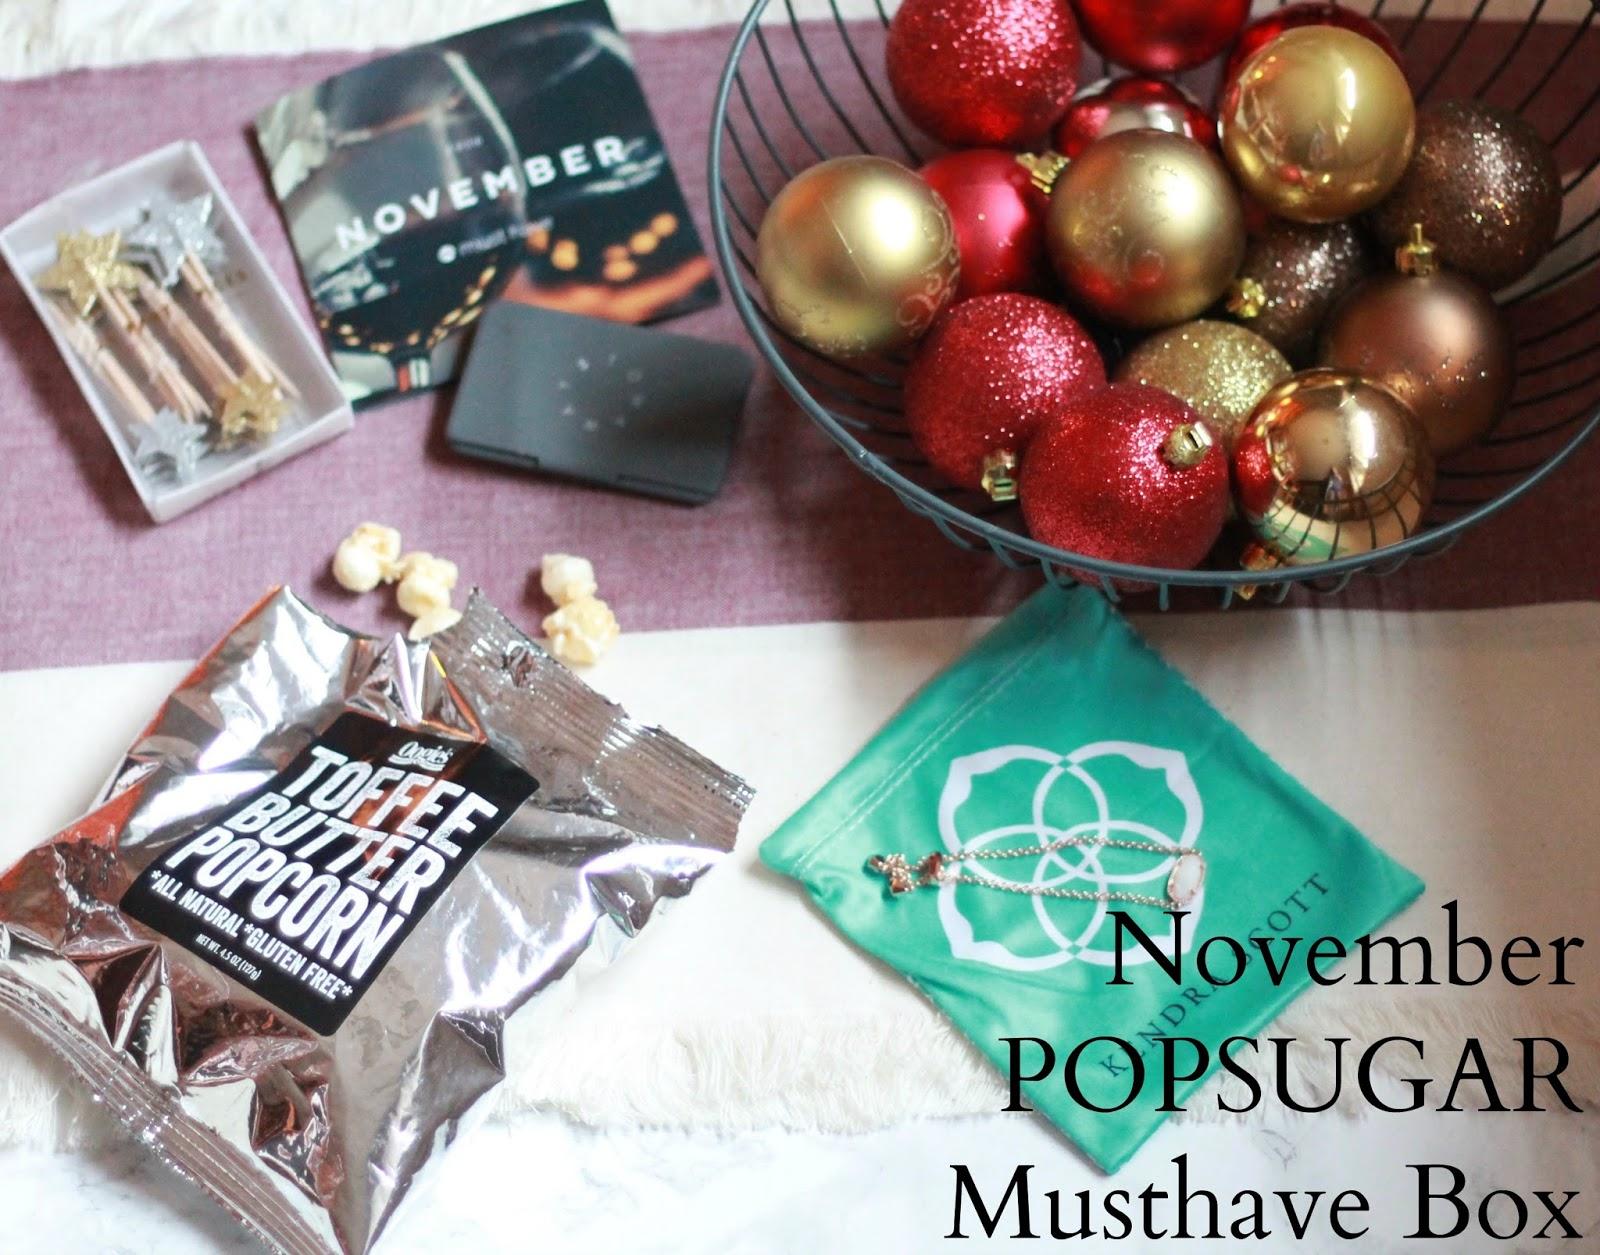 November POPSUGAR Musthave box review